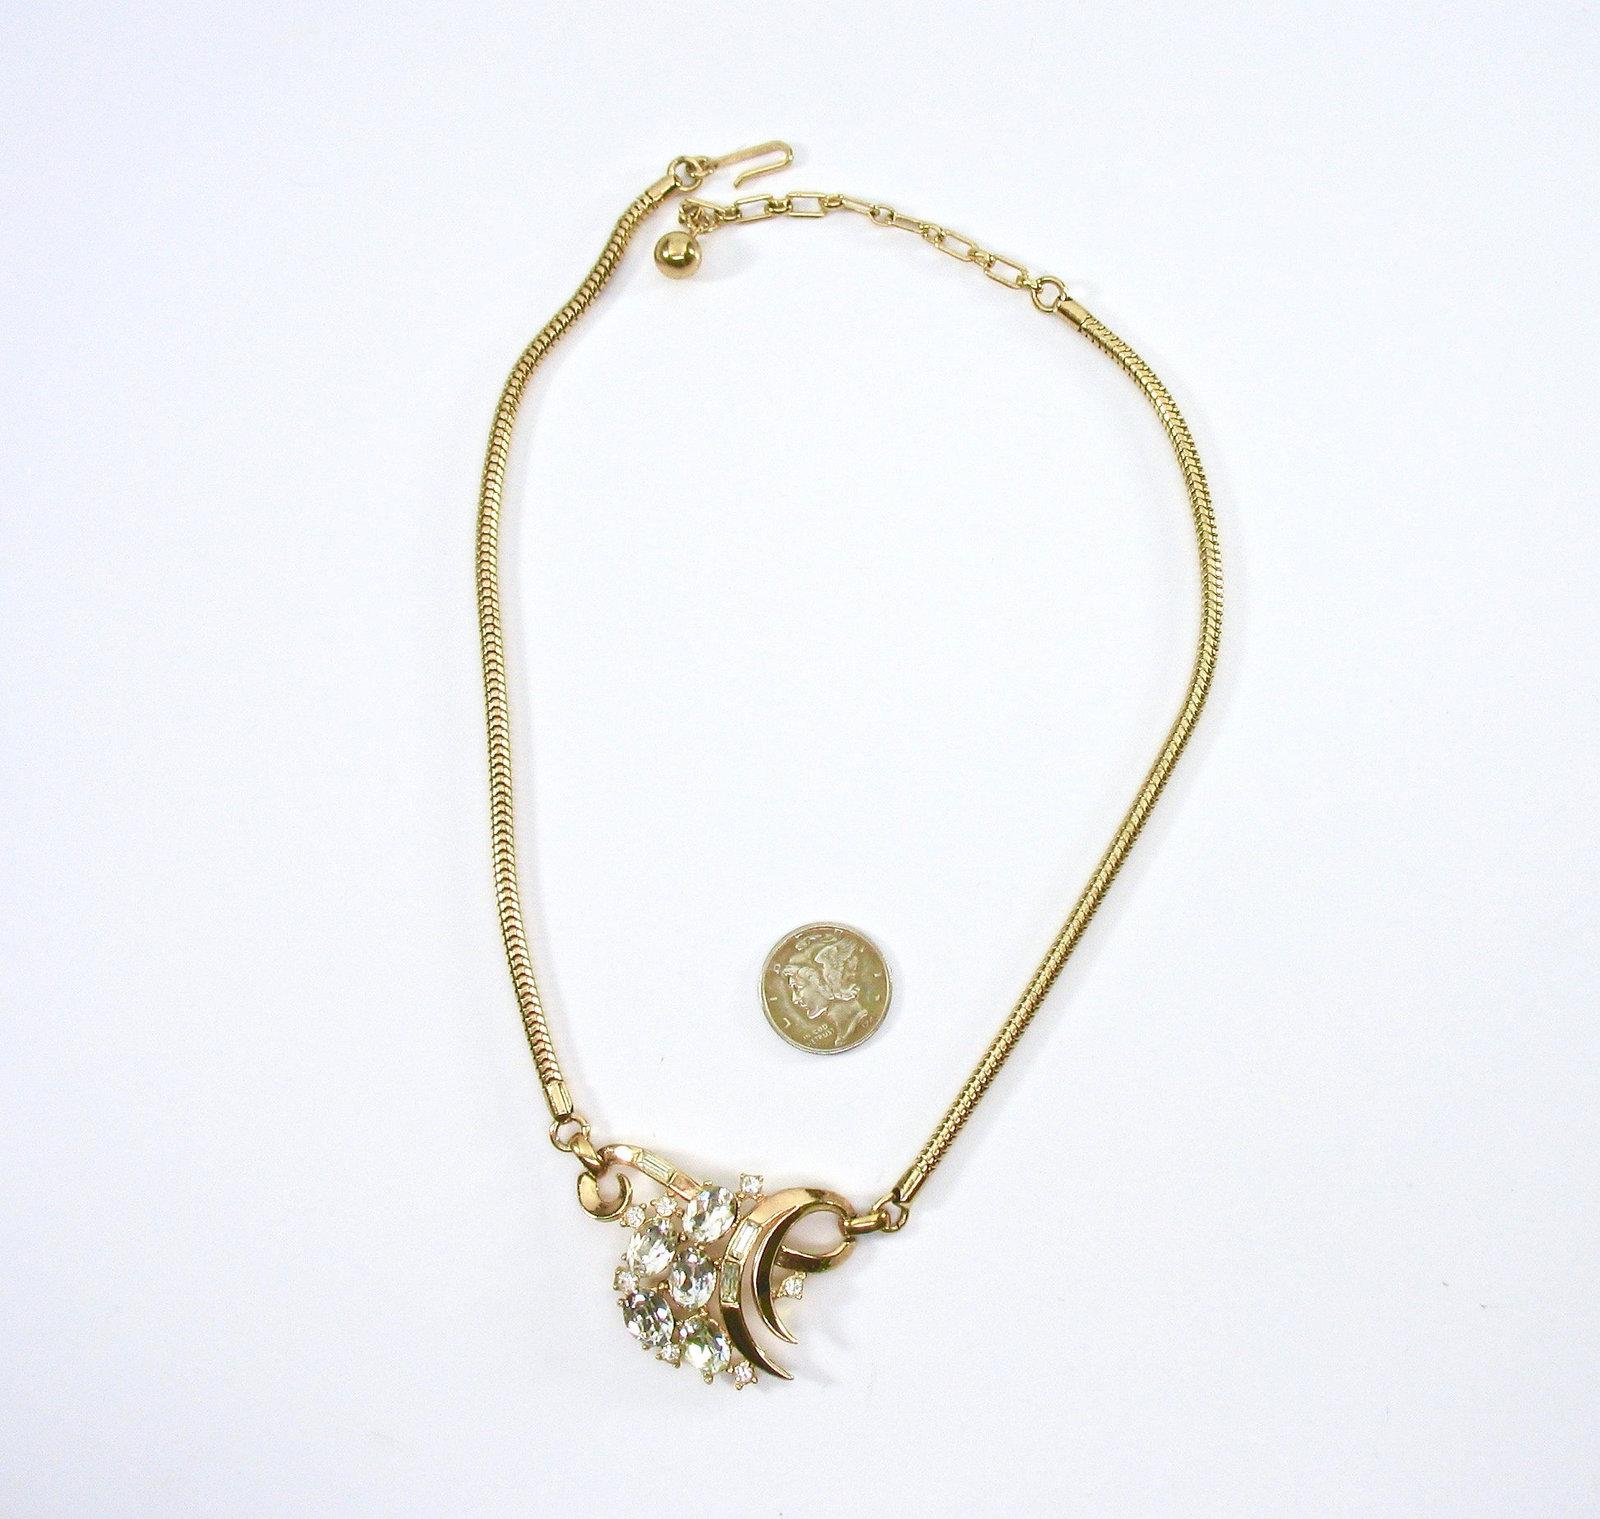 Rhinestone Necklace, Clear Baguettes, Lavalier, Flexible, Mid-Century, 1950's, H